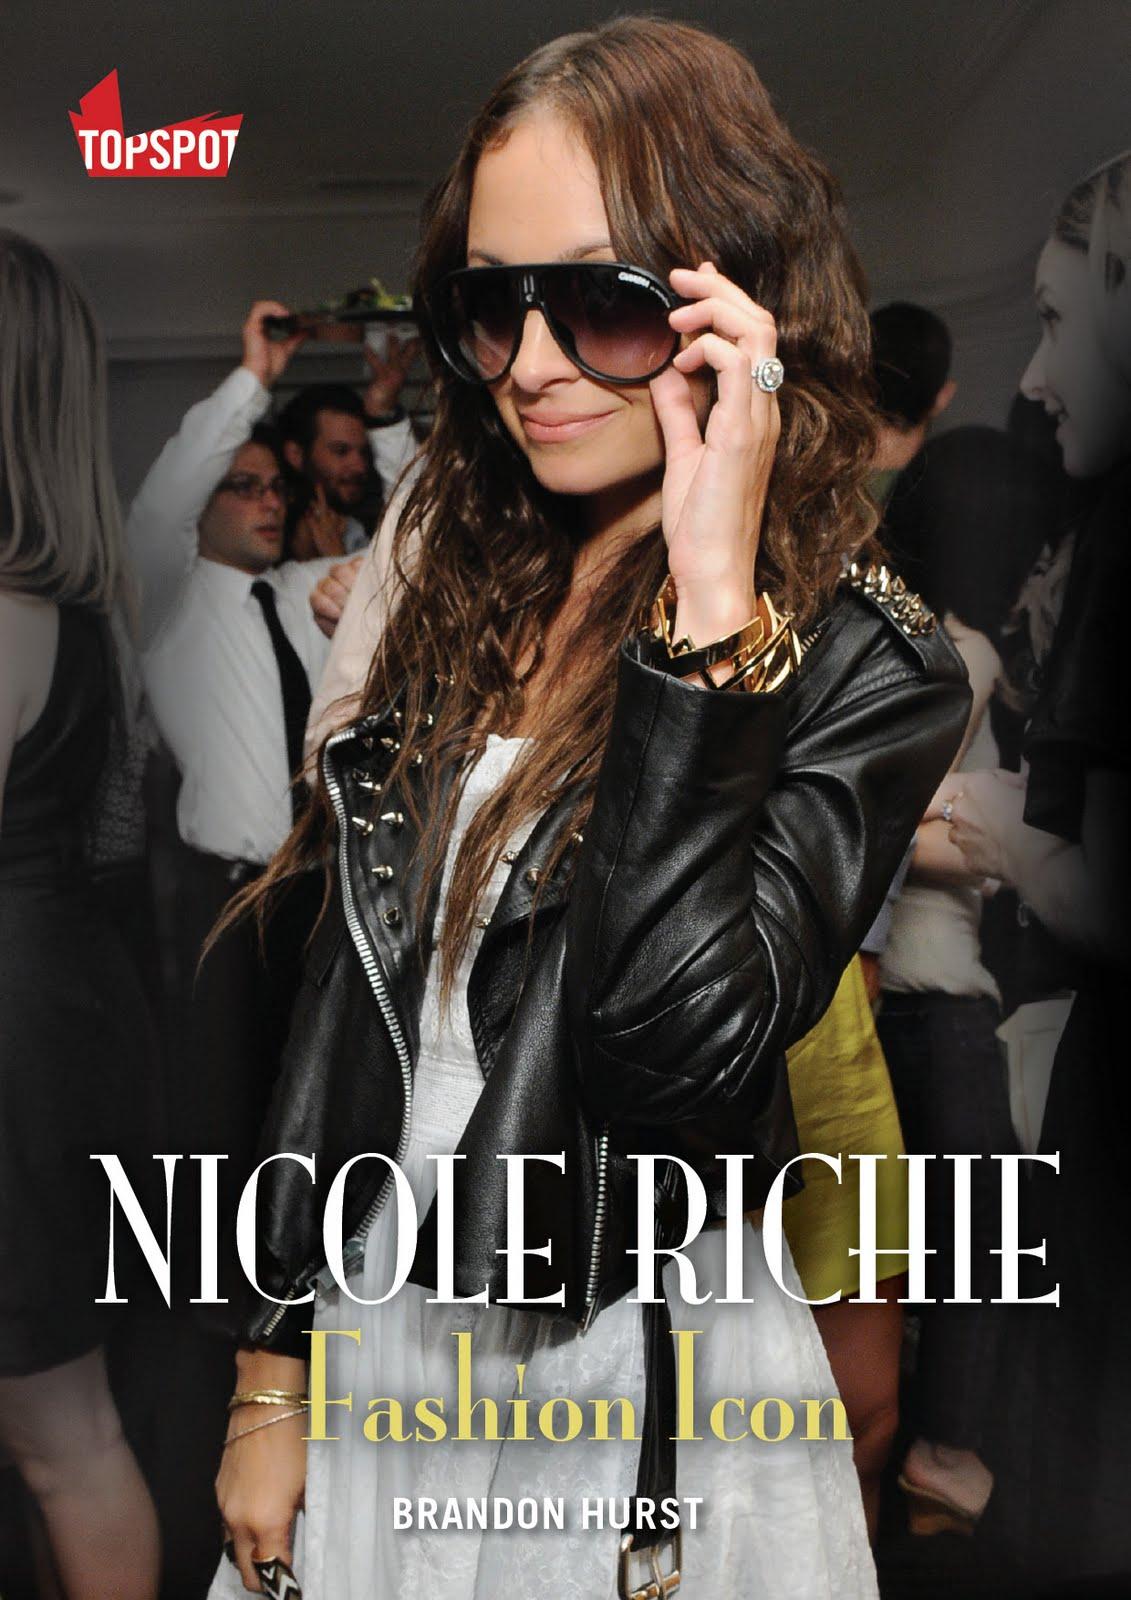 http://4.bp.blogspot.com/_ygRAqJeep-s/TOZMqqidzsI/AAAAAAAAHQA/2NBNvWN2FTk/s1600/nicole-richie-fashion-book-cover-1.jpg